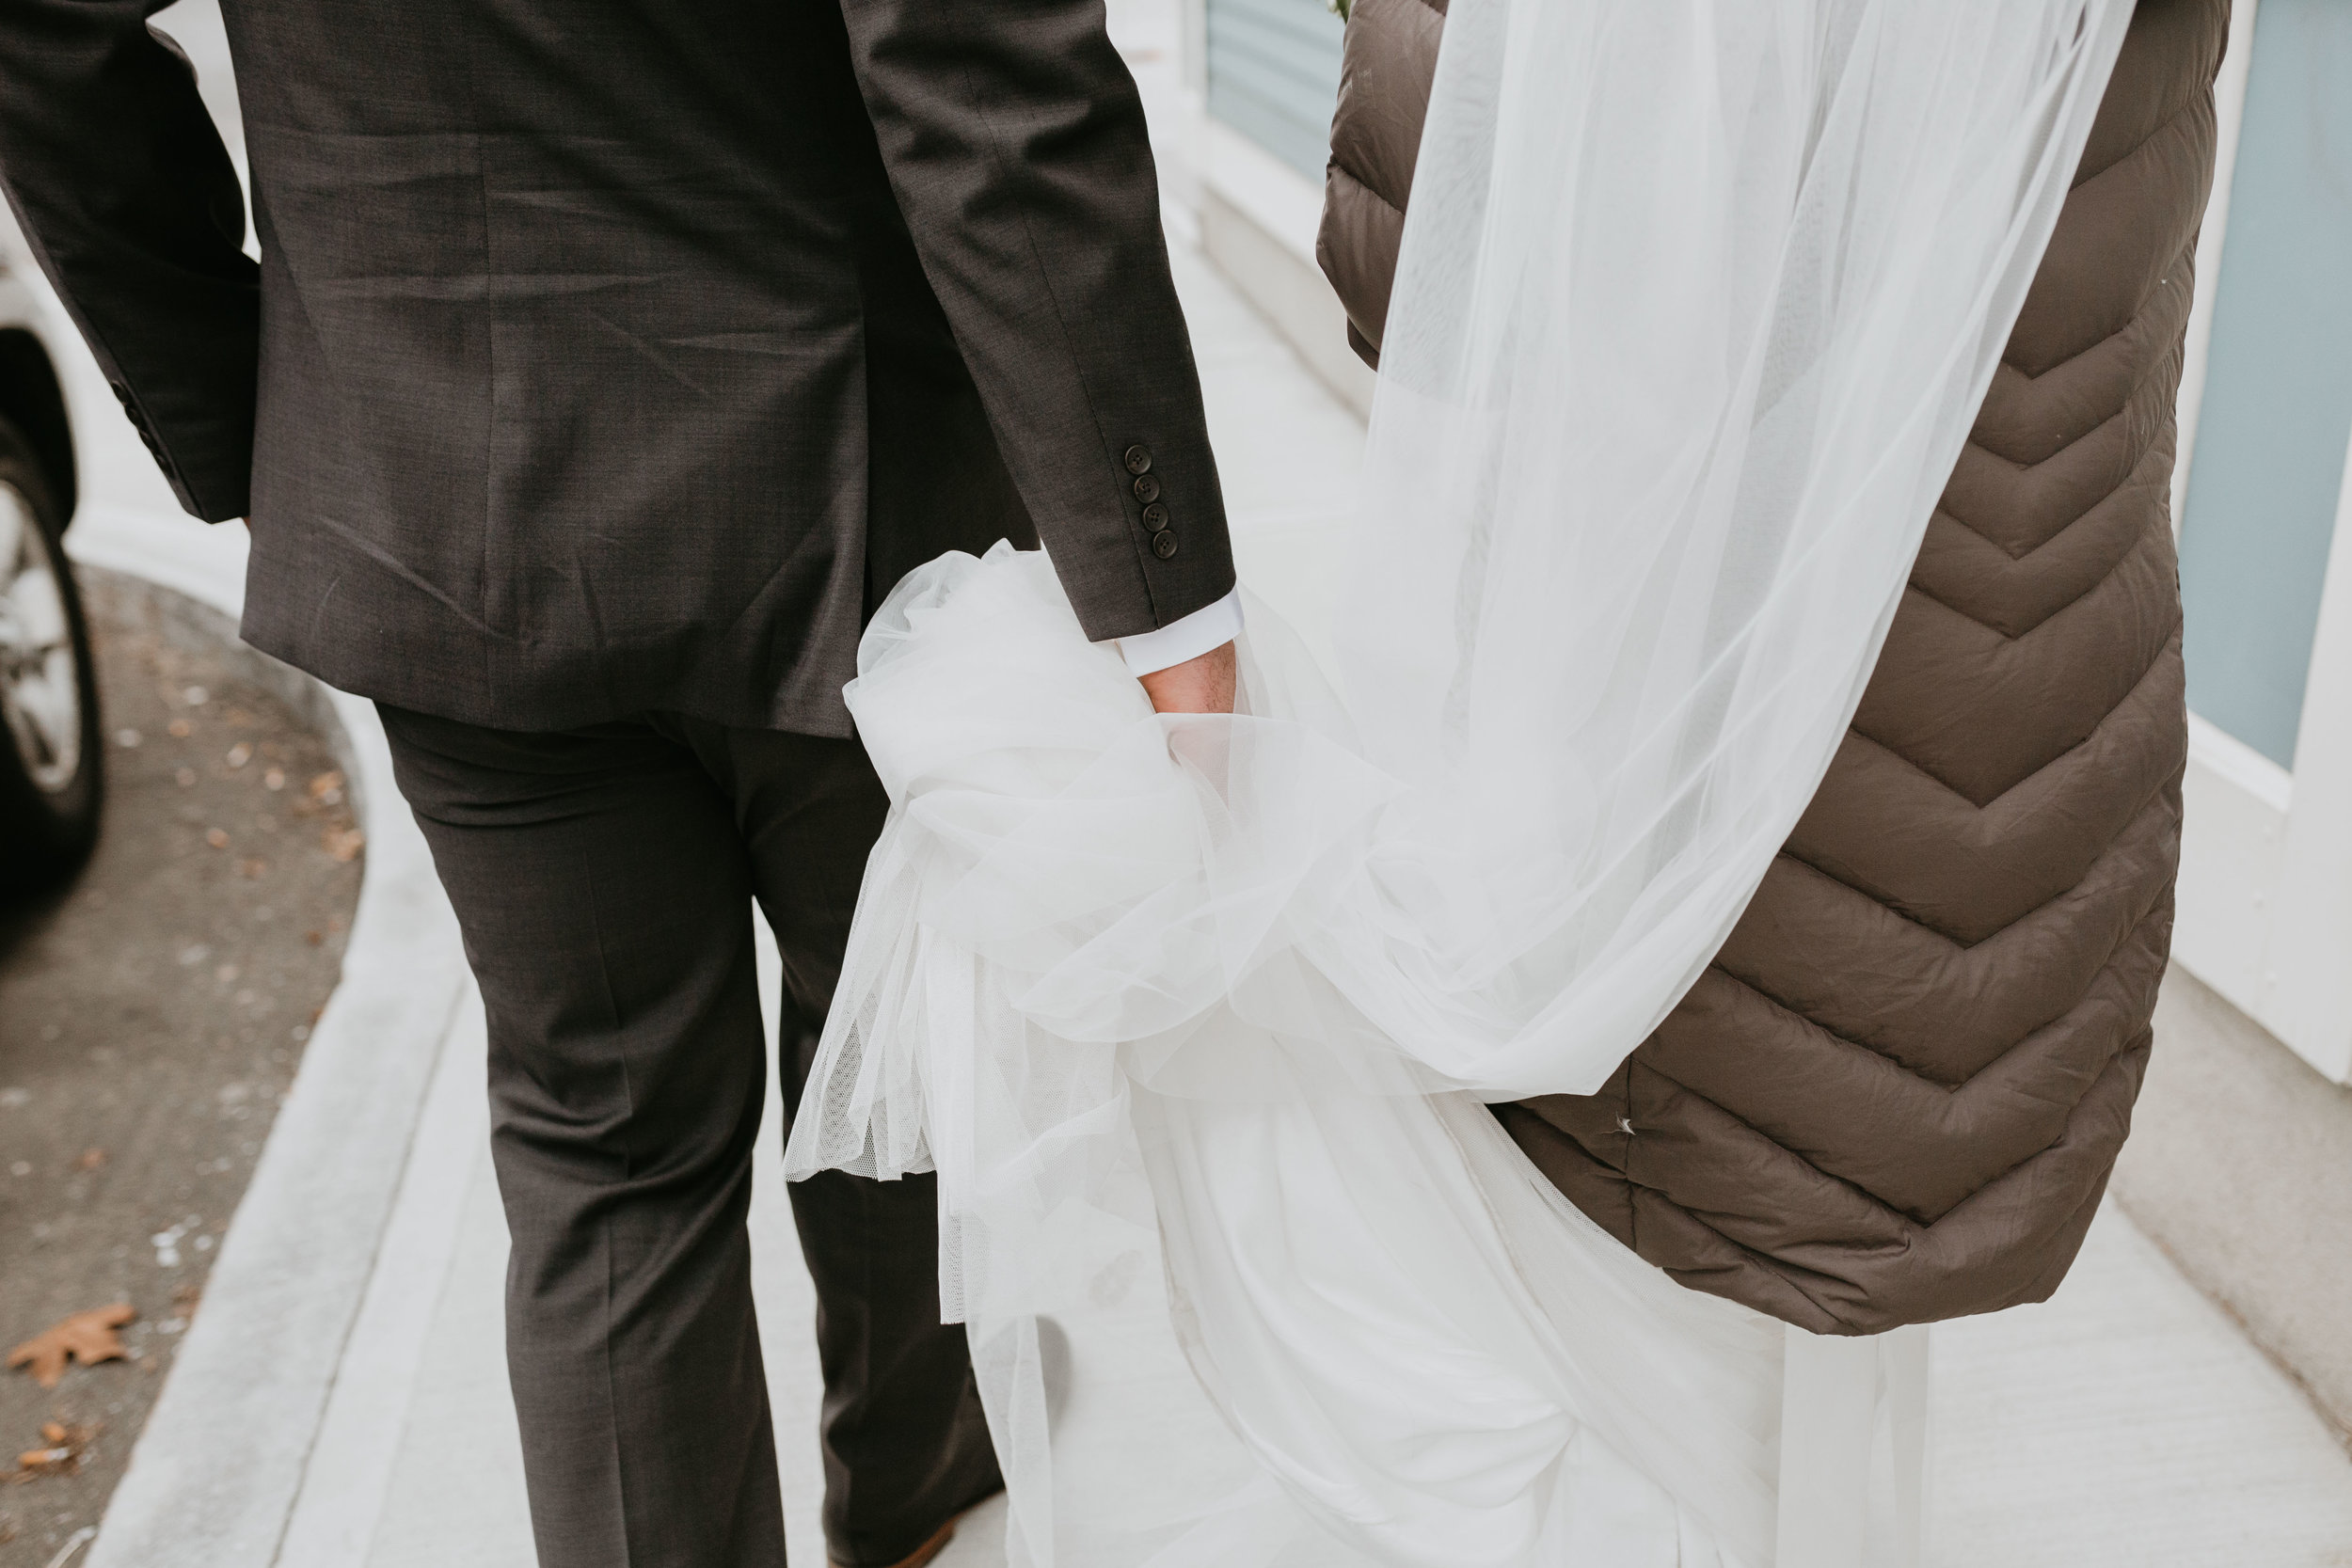 nicole-daacke-photography-boston-massachusetts-seaside-intimate-winter-wedding-photographer-36.jpg